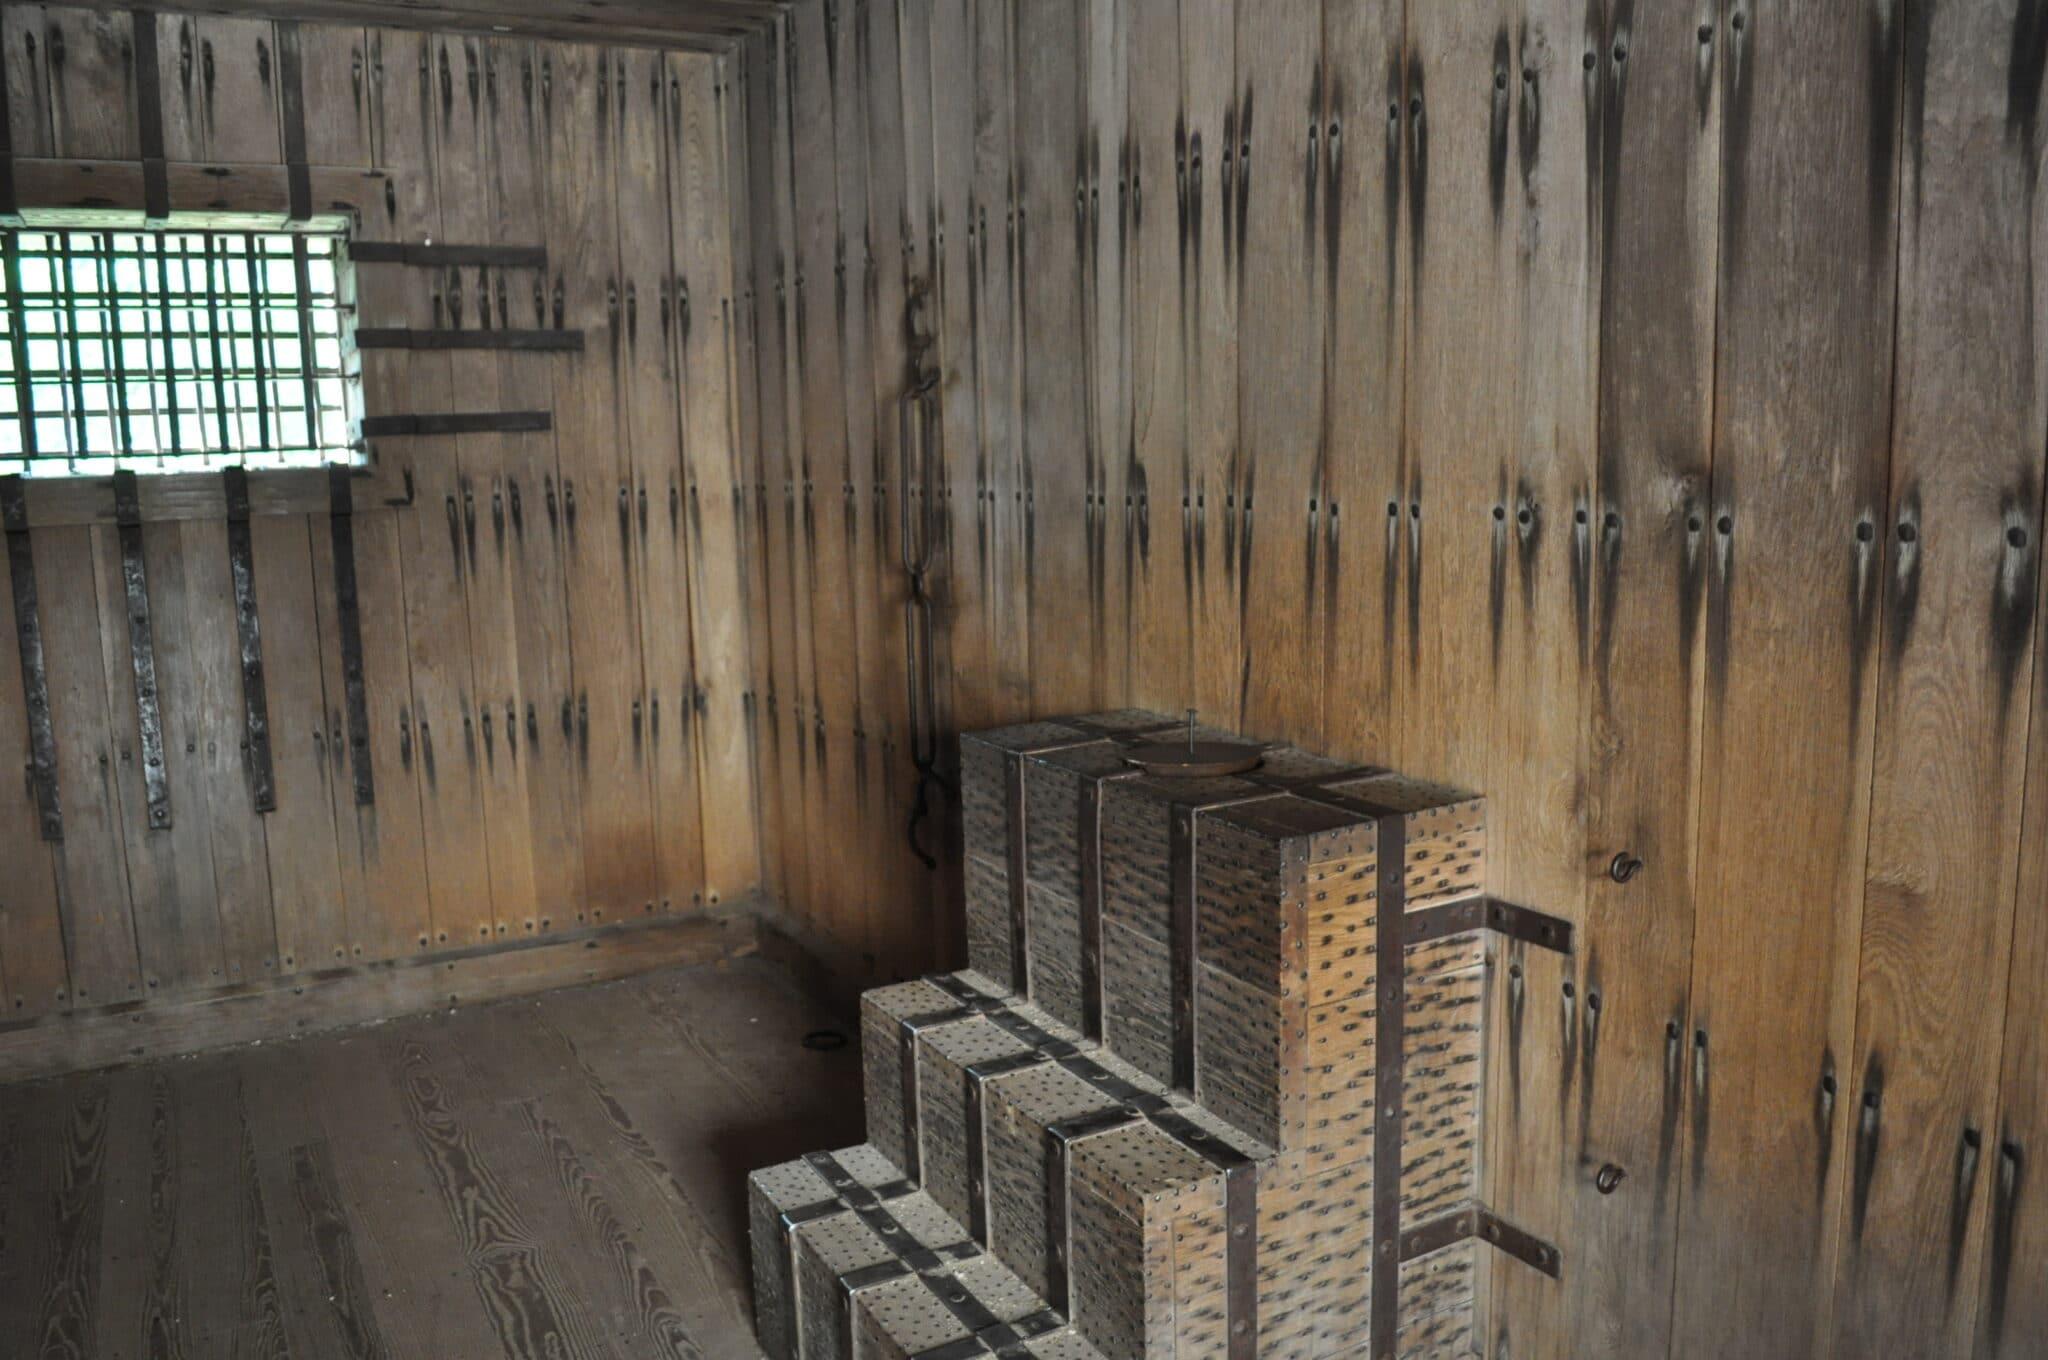 Williamsburg Gaol madeinaday.com